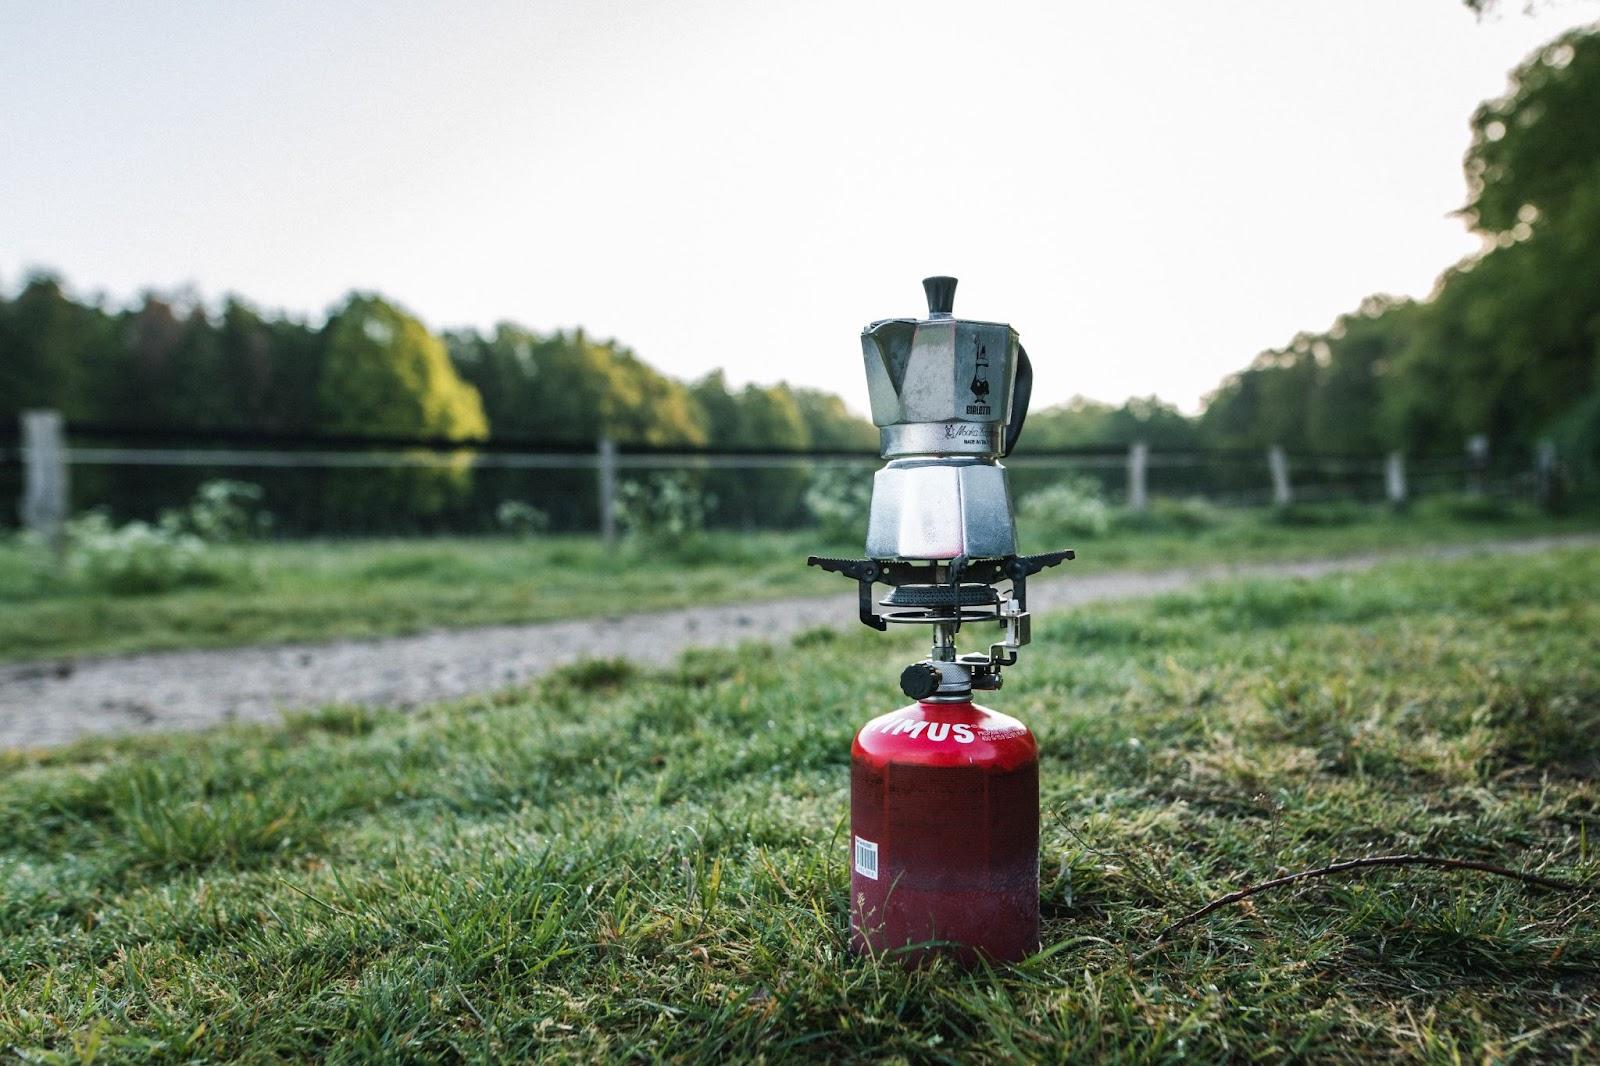 Gas burner outdoor life hacks campspace